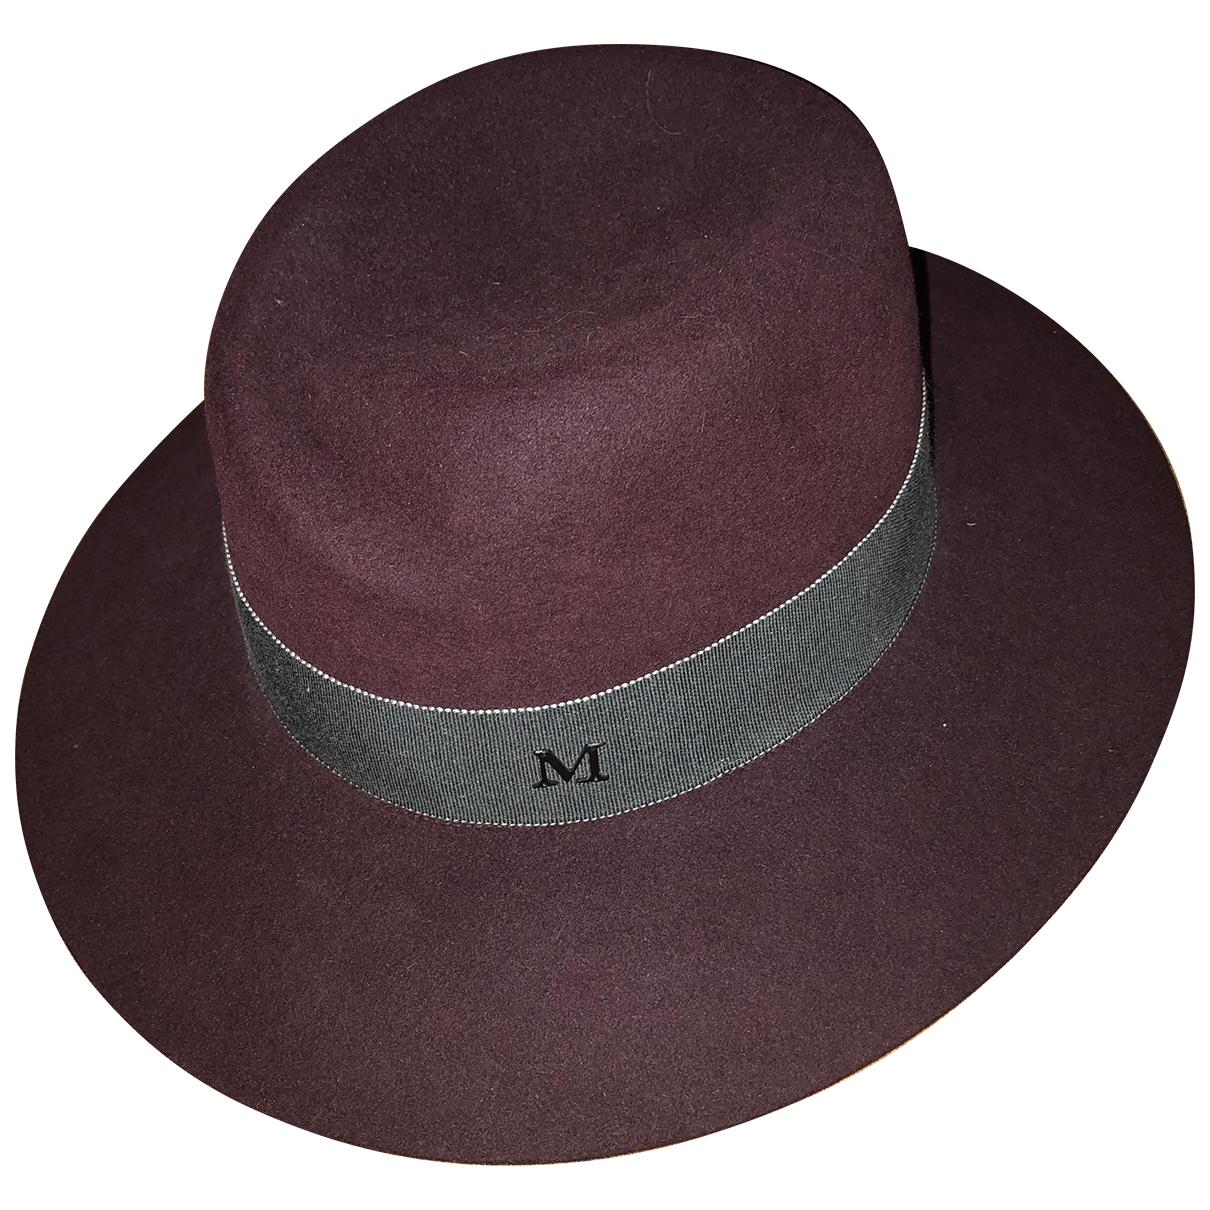 Maison Michel \N Burgundy Wool hat for Women M International